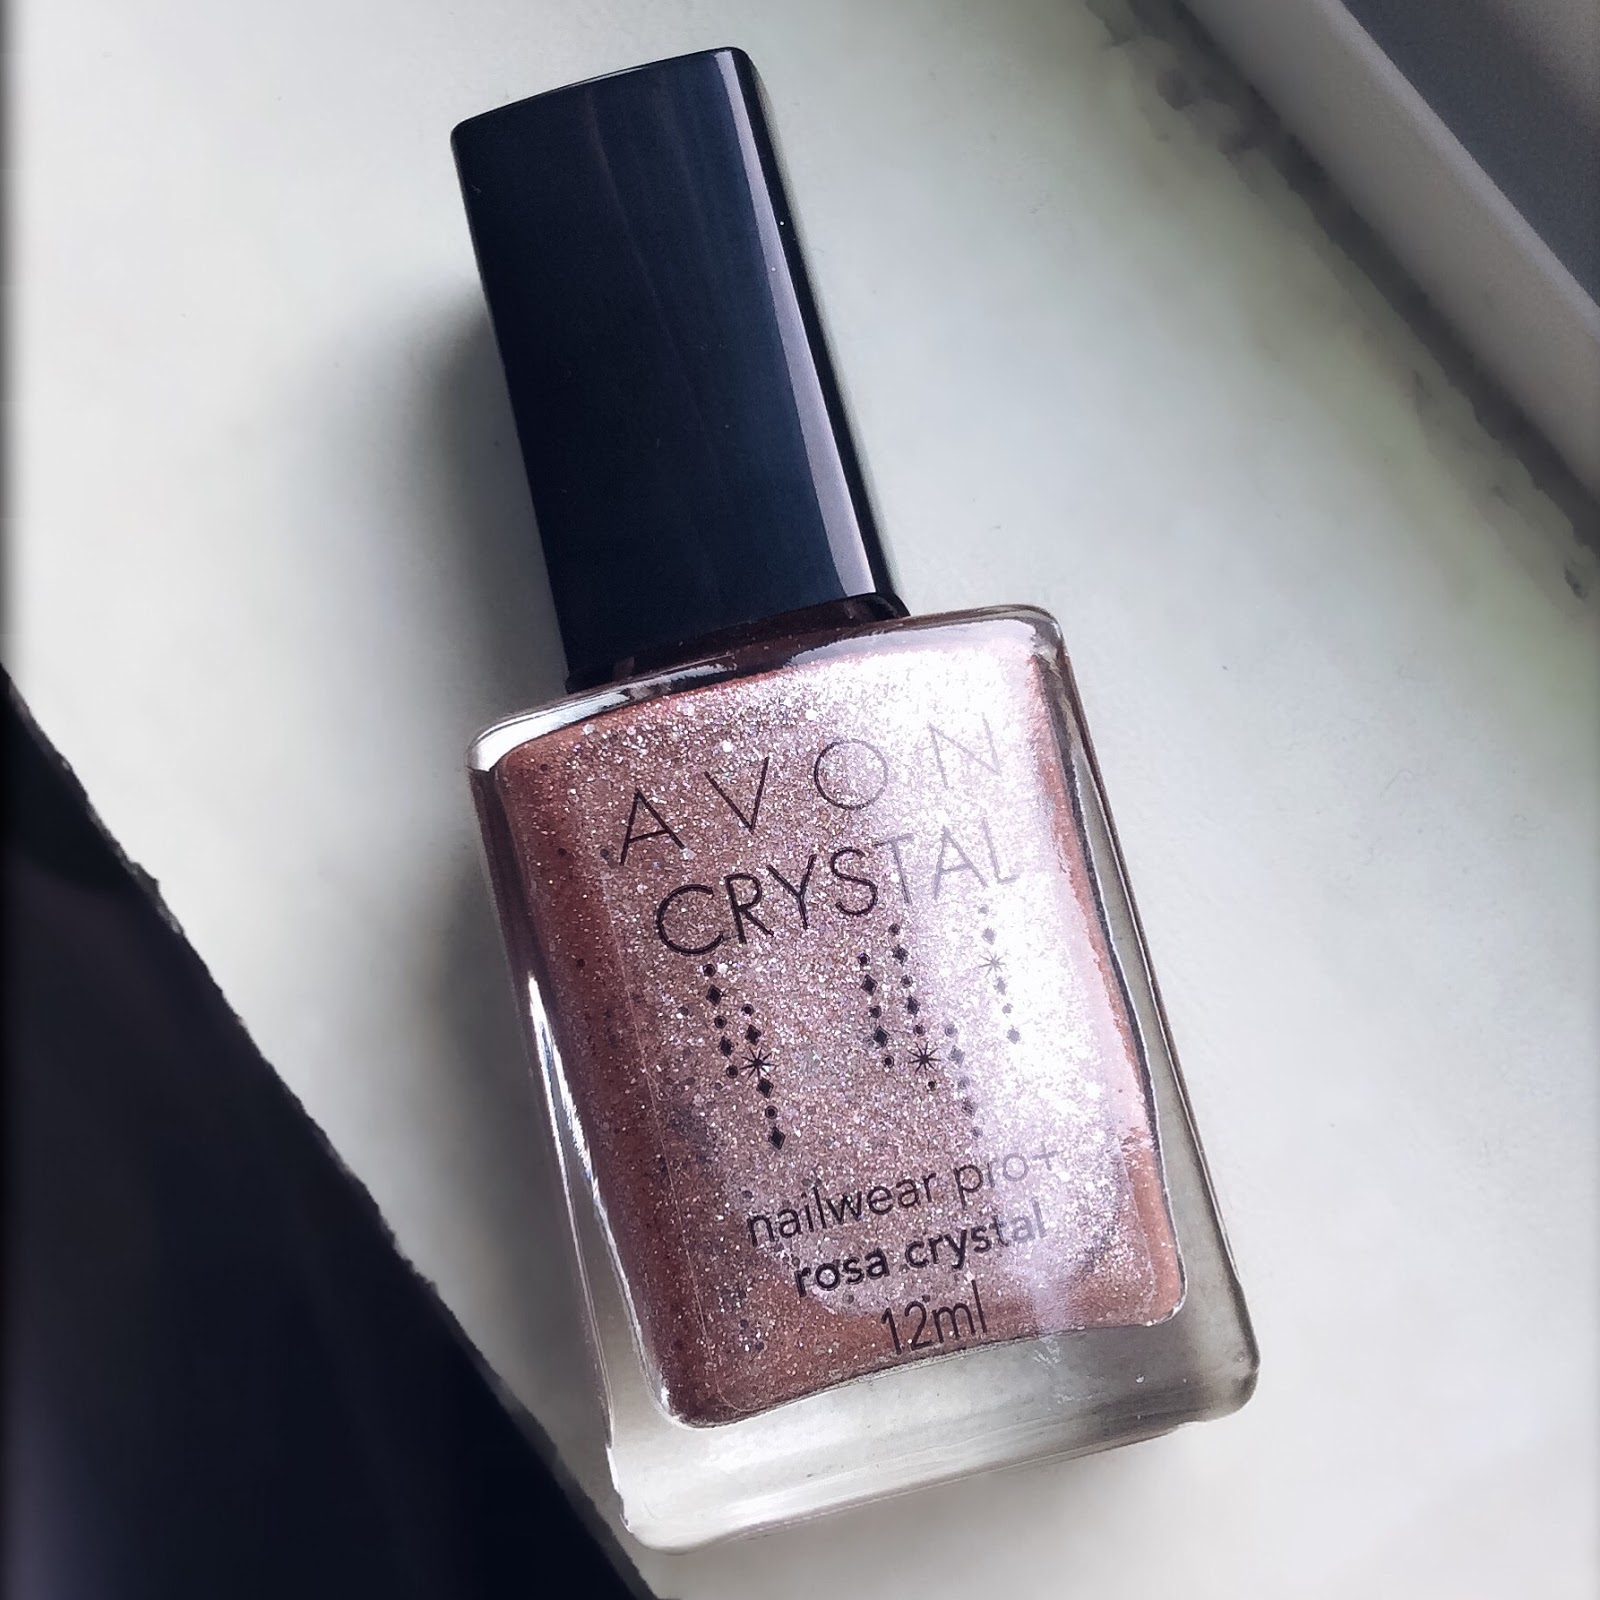 Esmalte da Semana: Avon Rosa Crystal